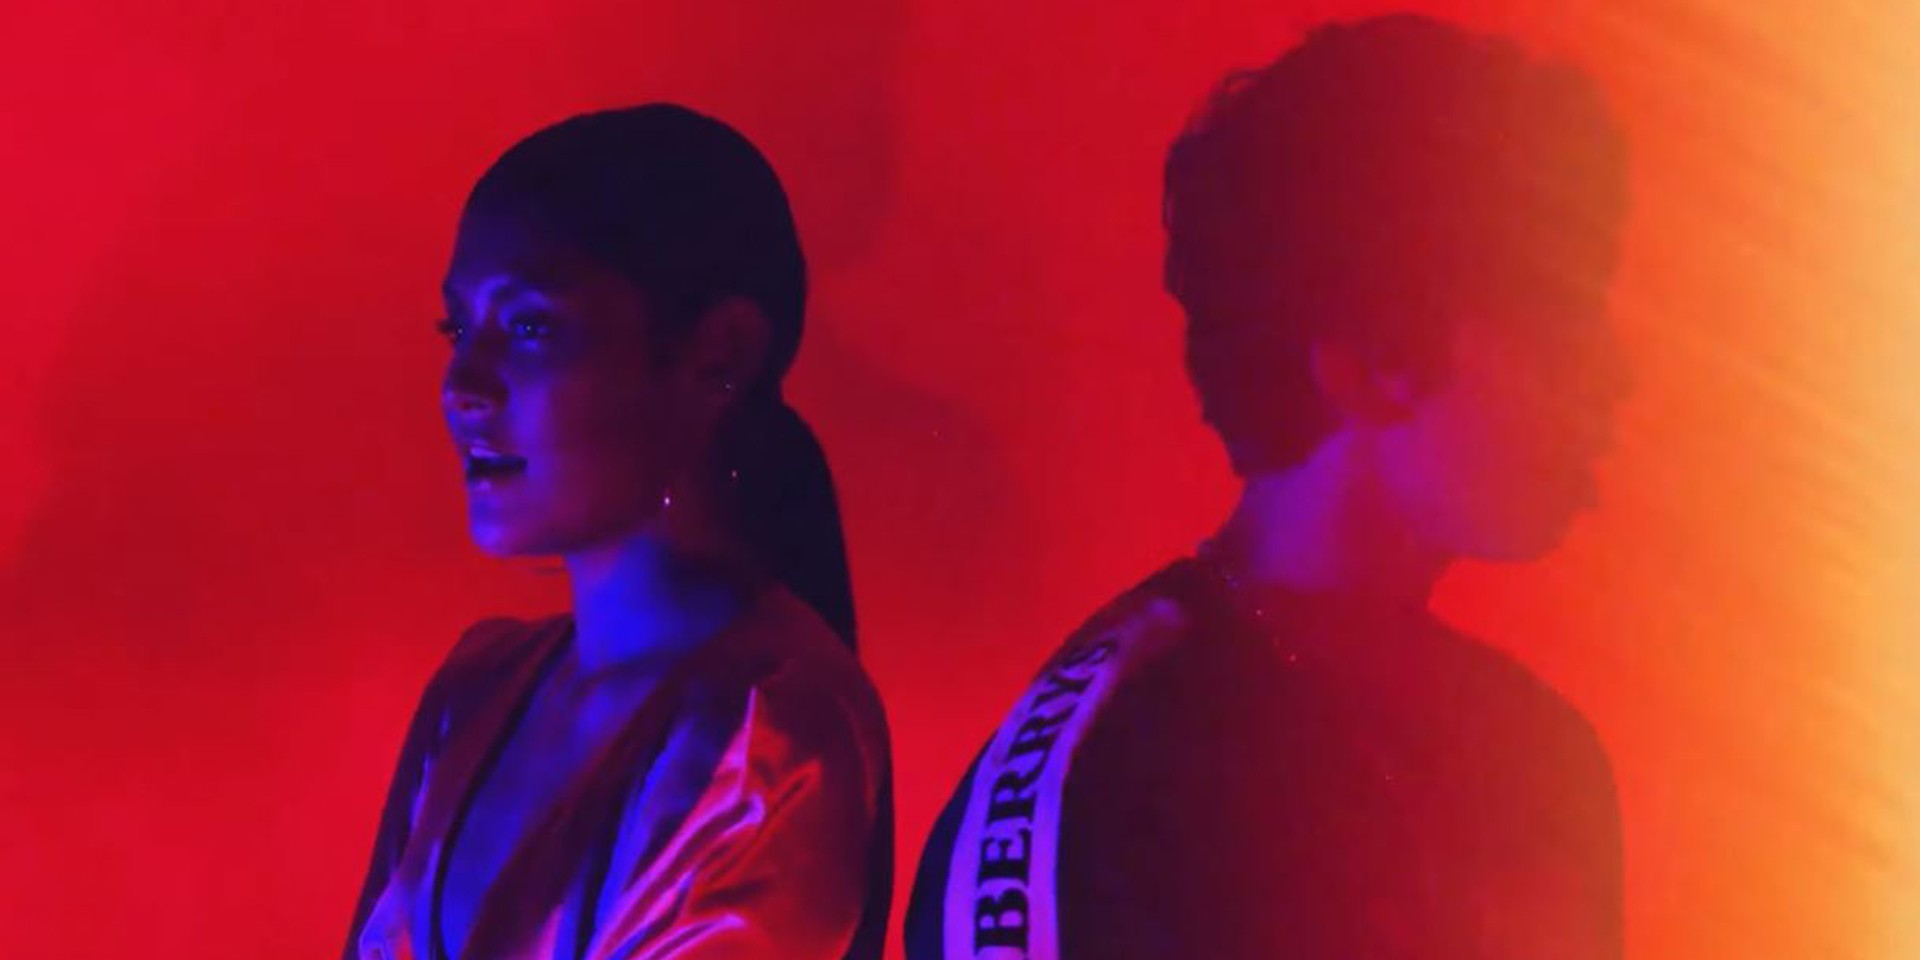 Fern. and Kiana Valenciano drop 'SWEET' music video – watch